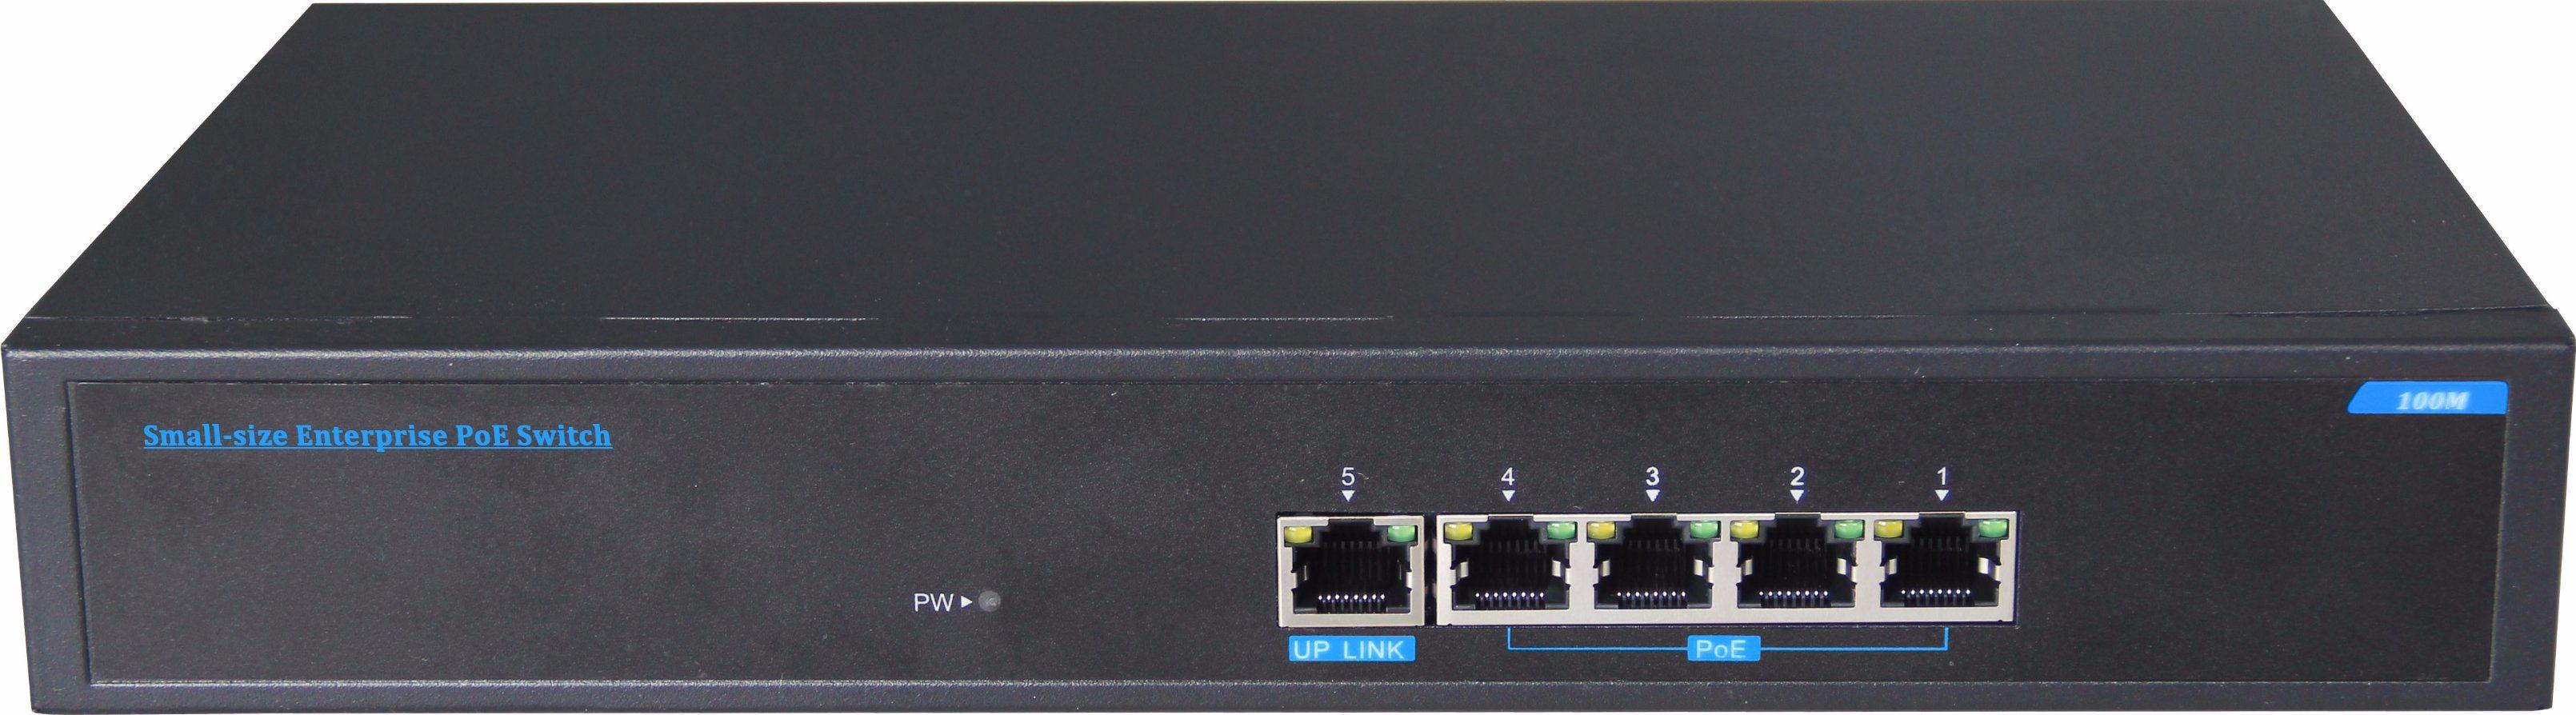 4 Poe with 1 Uplink Port 30W Power Ethernet Network Switch